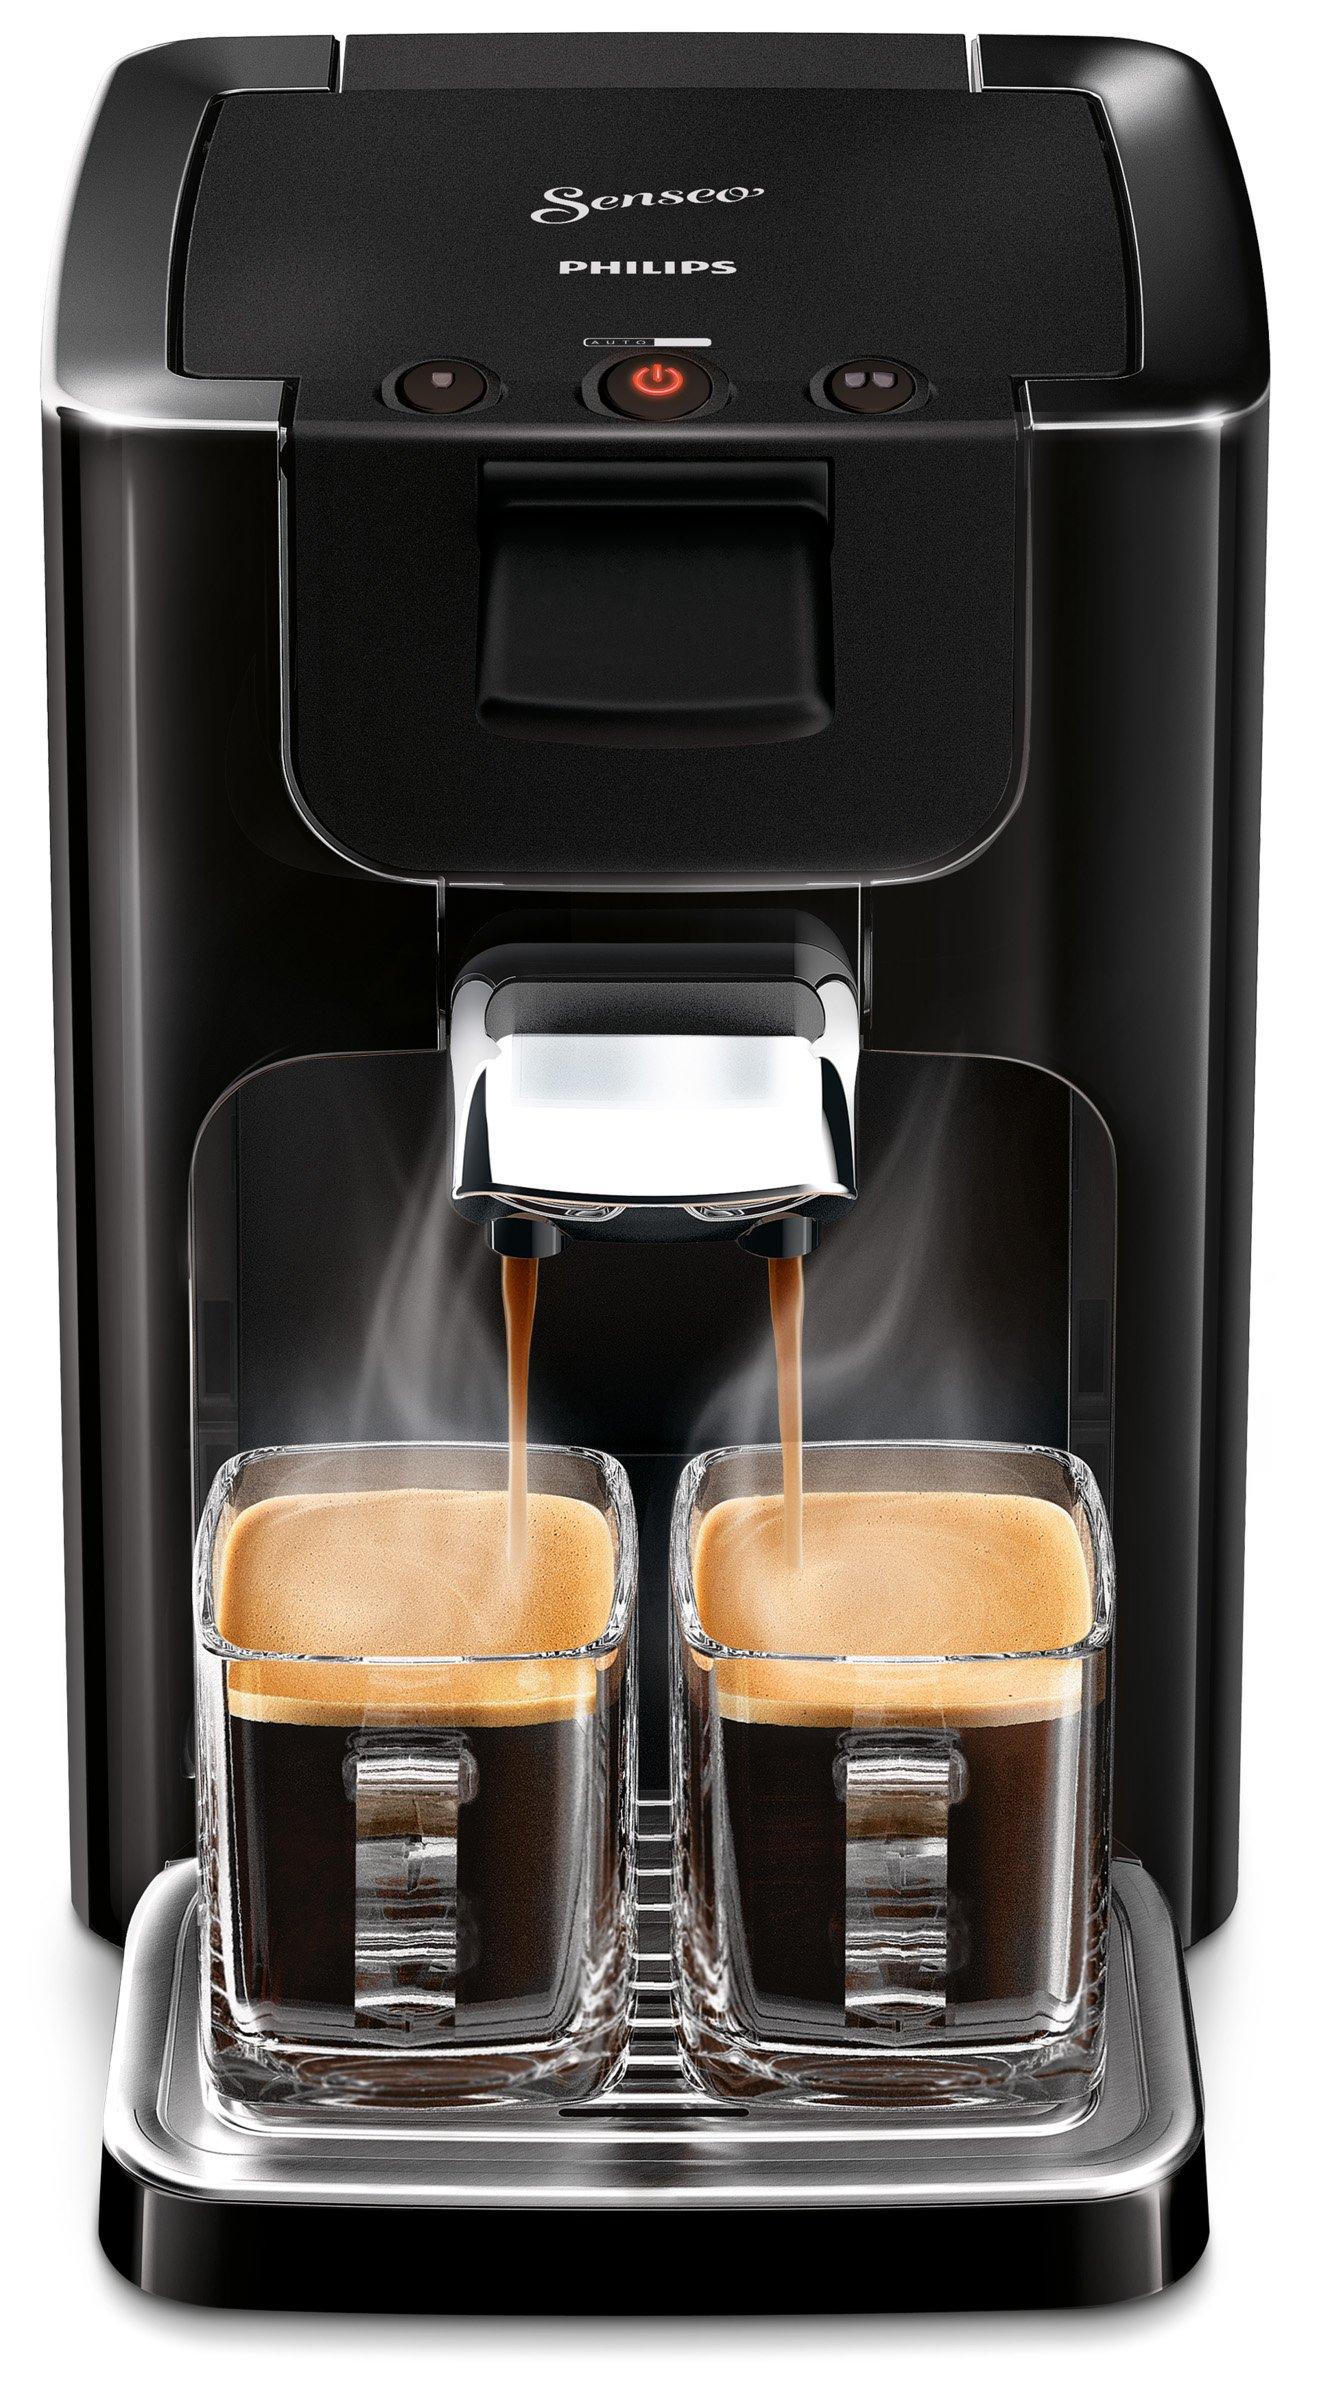 Senseo-Quadrante-hd786560-Coffee-Machine-in-Capsules-12L-8-Cups-Black-Coffee-Freestanding-Coffee-Machine-in-Capsules-Coffee-Beans-Coffee-Pods-Black-Buttons-5060-Hz